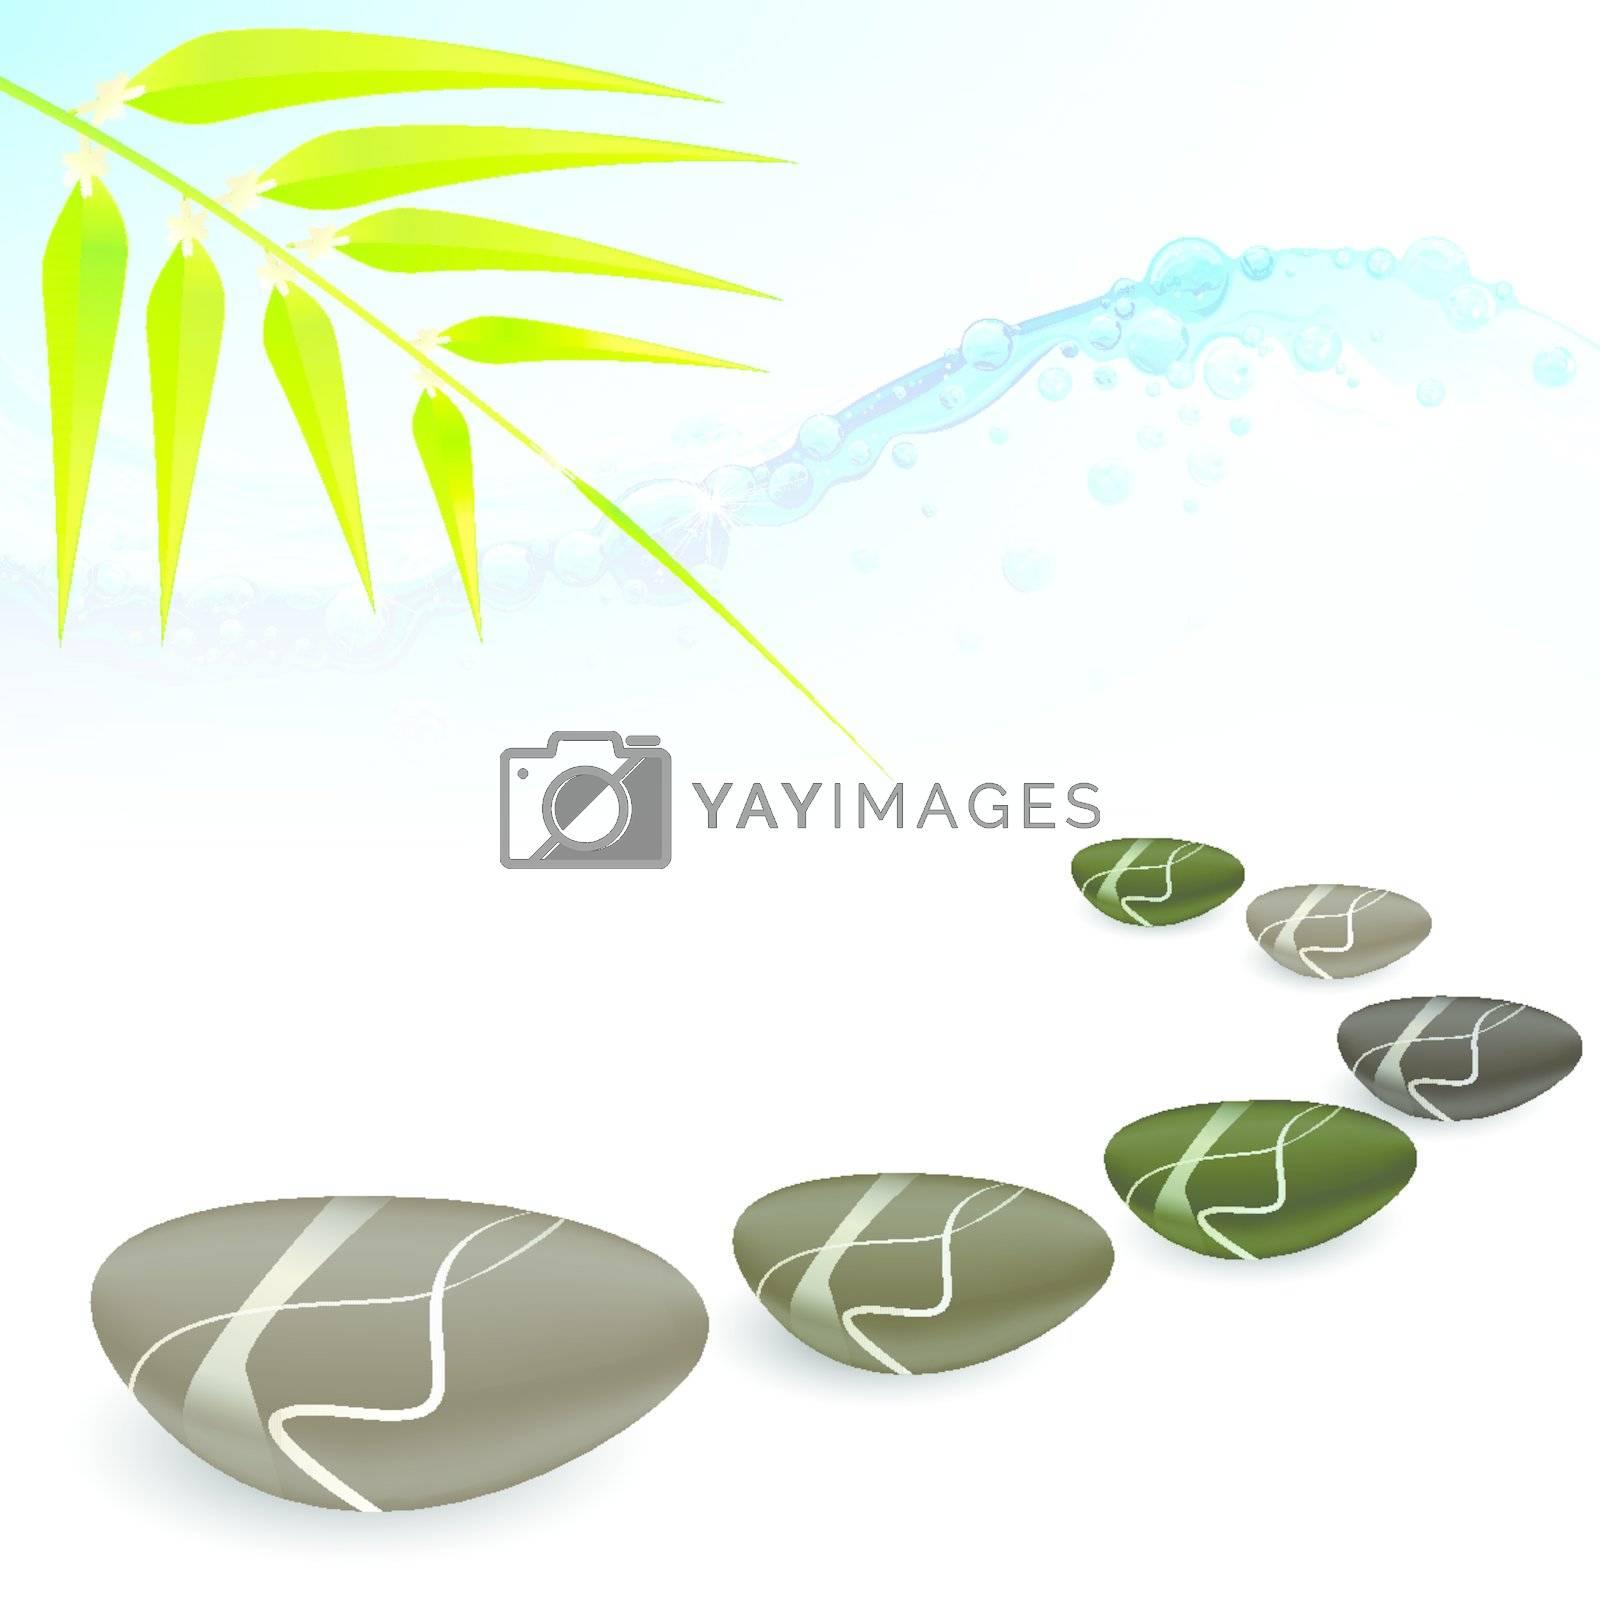 Royalty free image of spa concept zen basalt stones by nirots